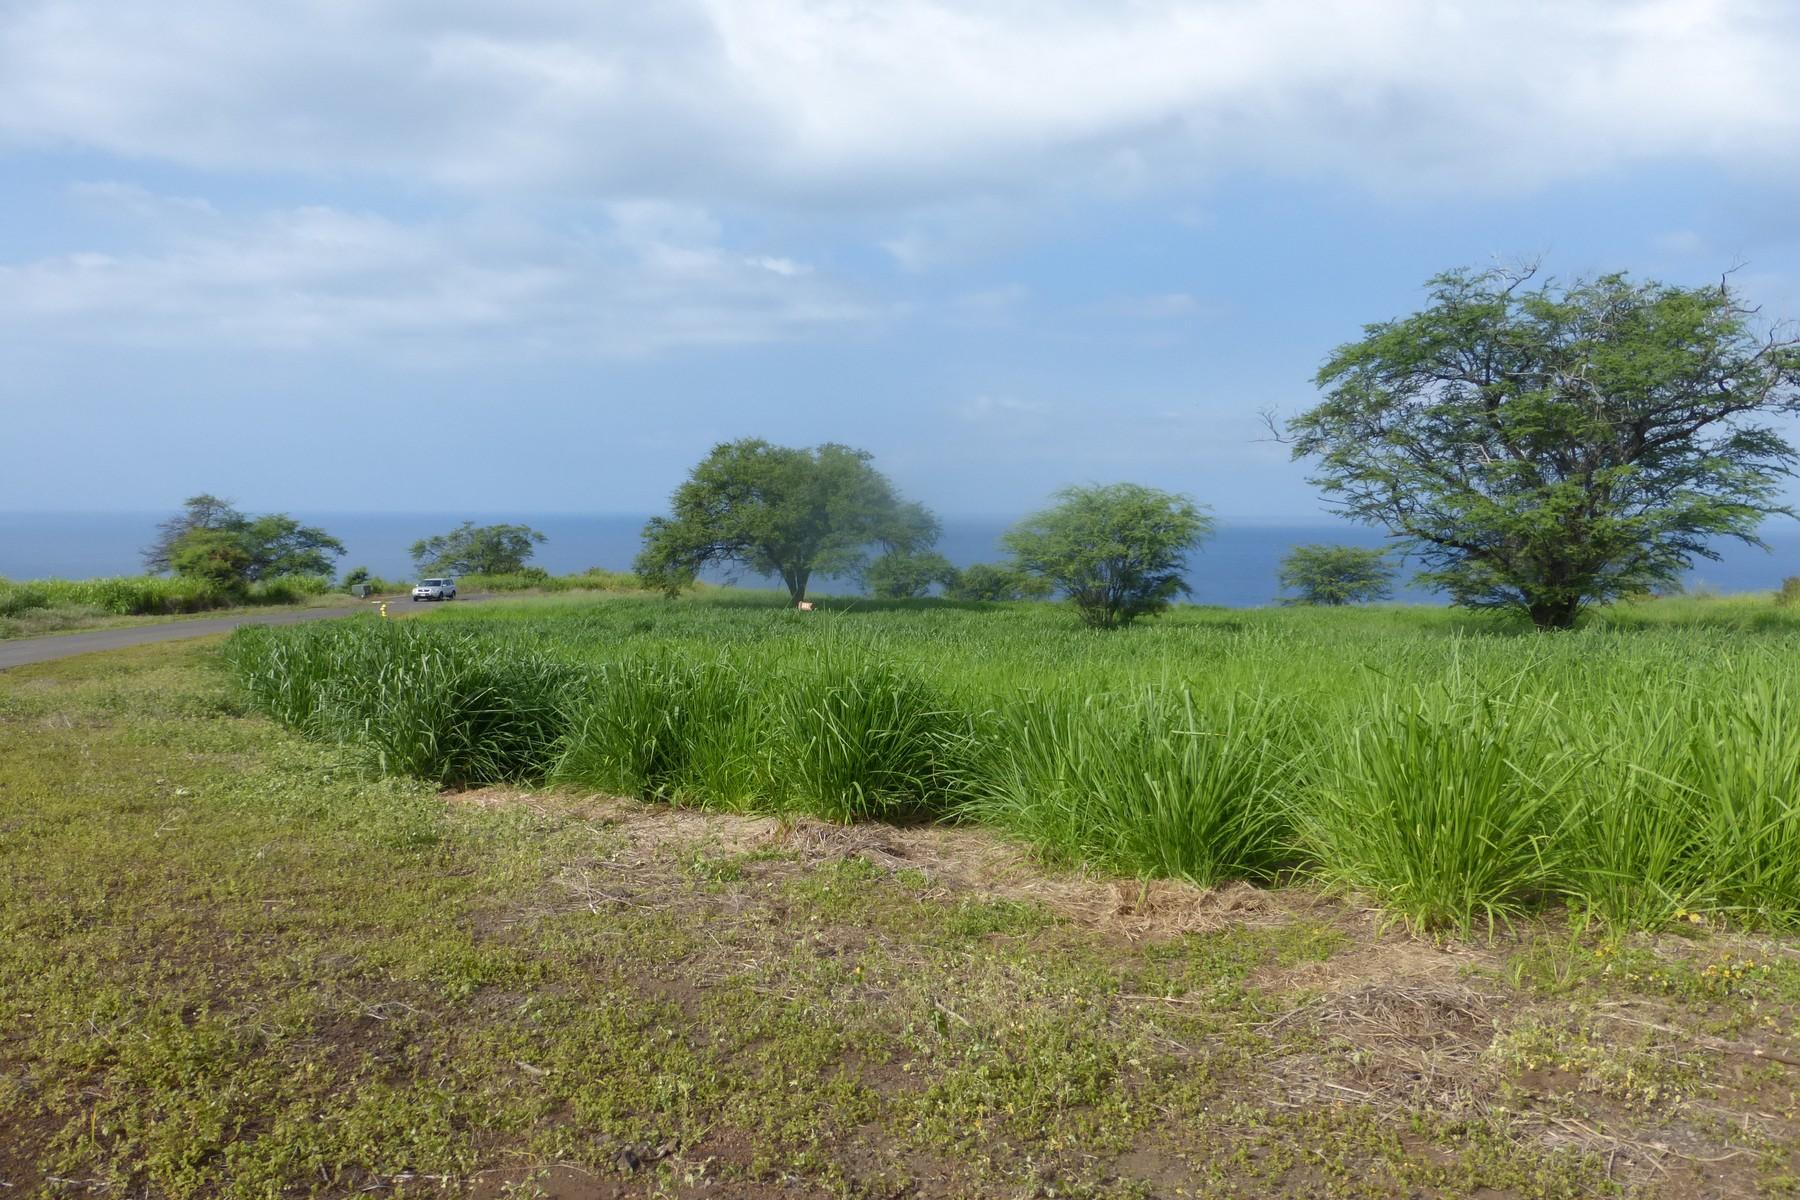 Land for Sale at Hokuli'a Phase 1 81-6559 Mau Pa Way Kealakekua, Hawaii, 96750 United States